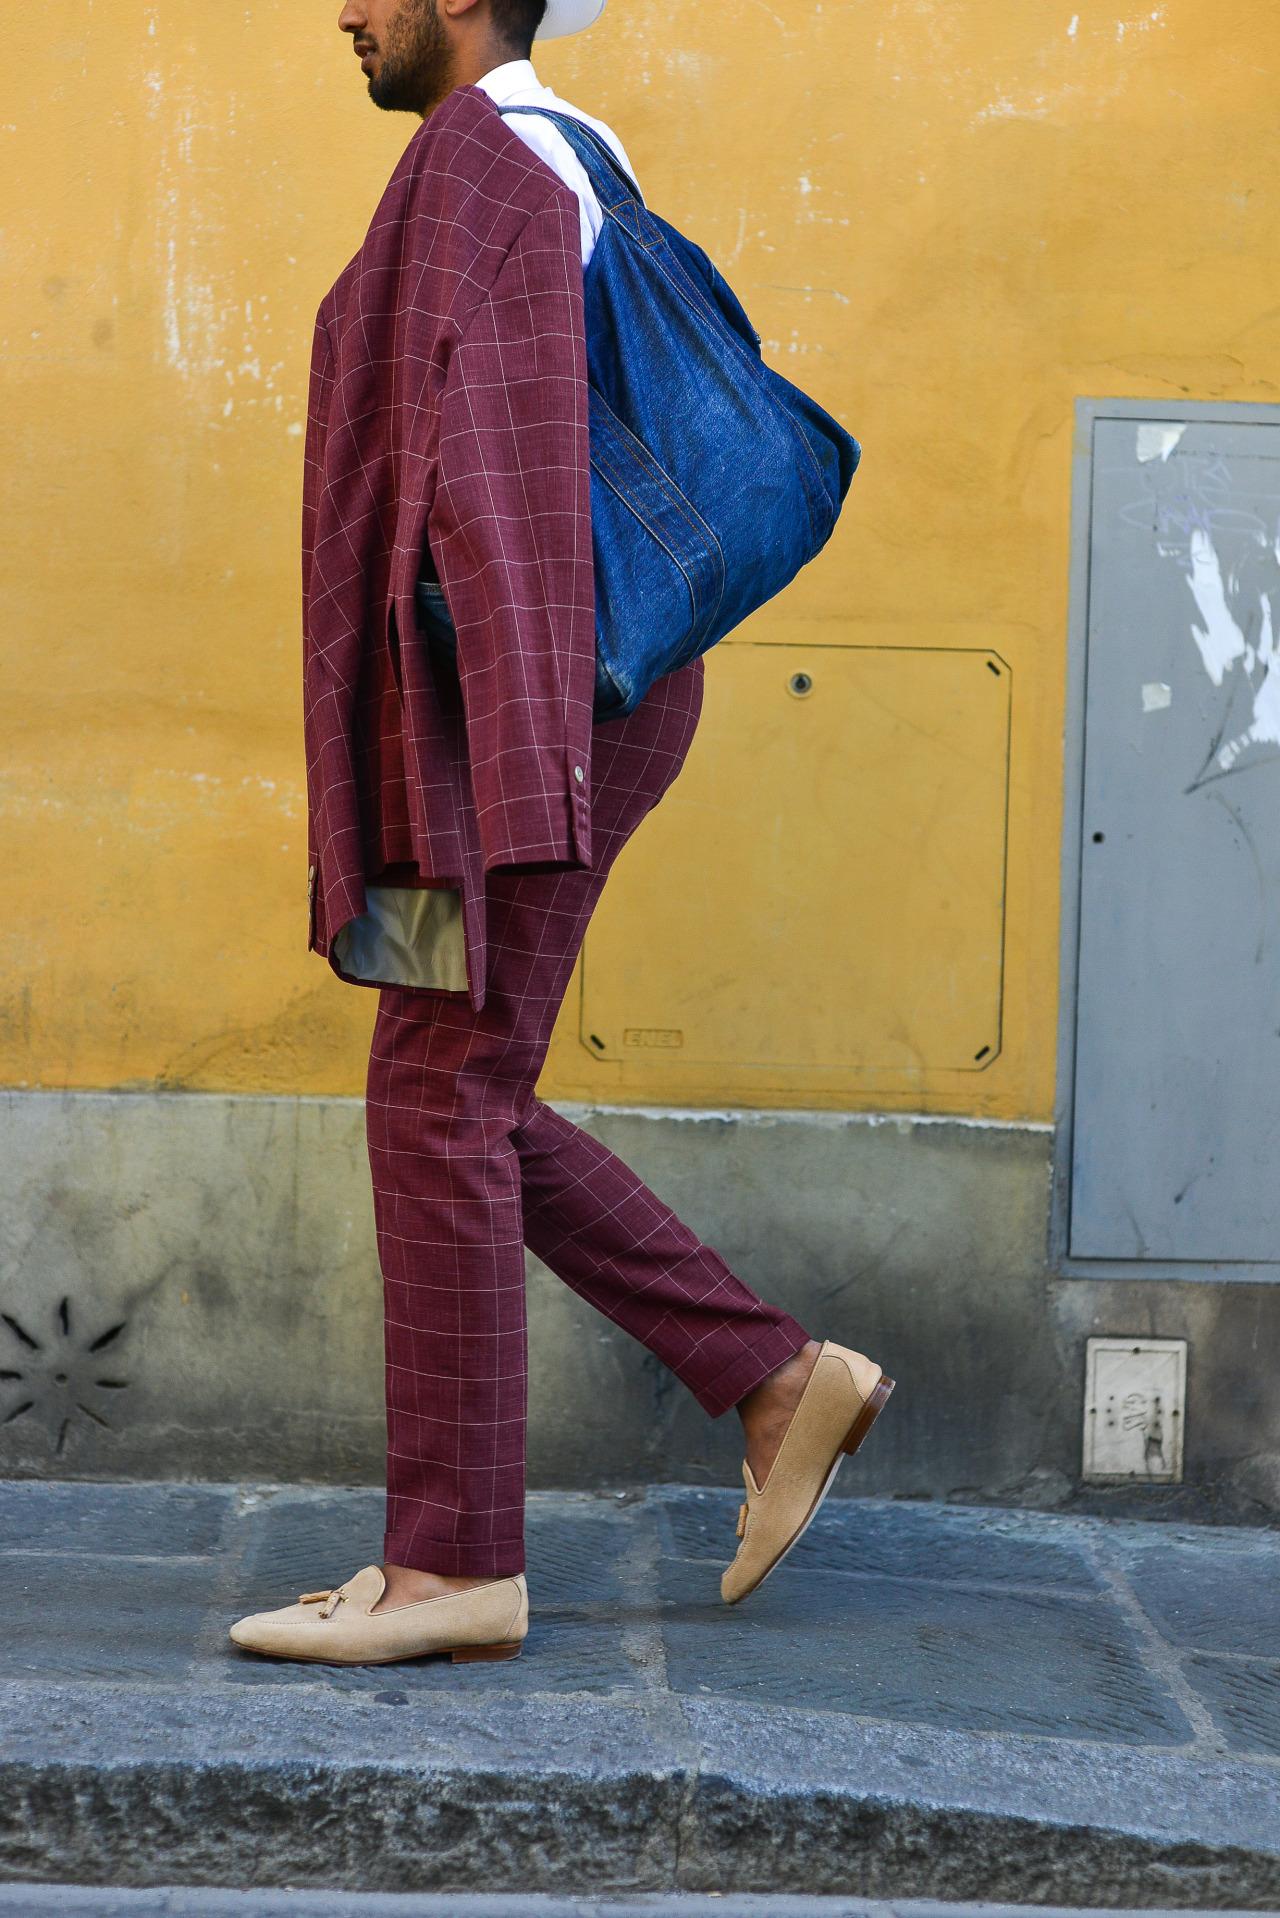 Thousand Yard Style, el blog que registra el street style masculino del momento